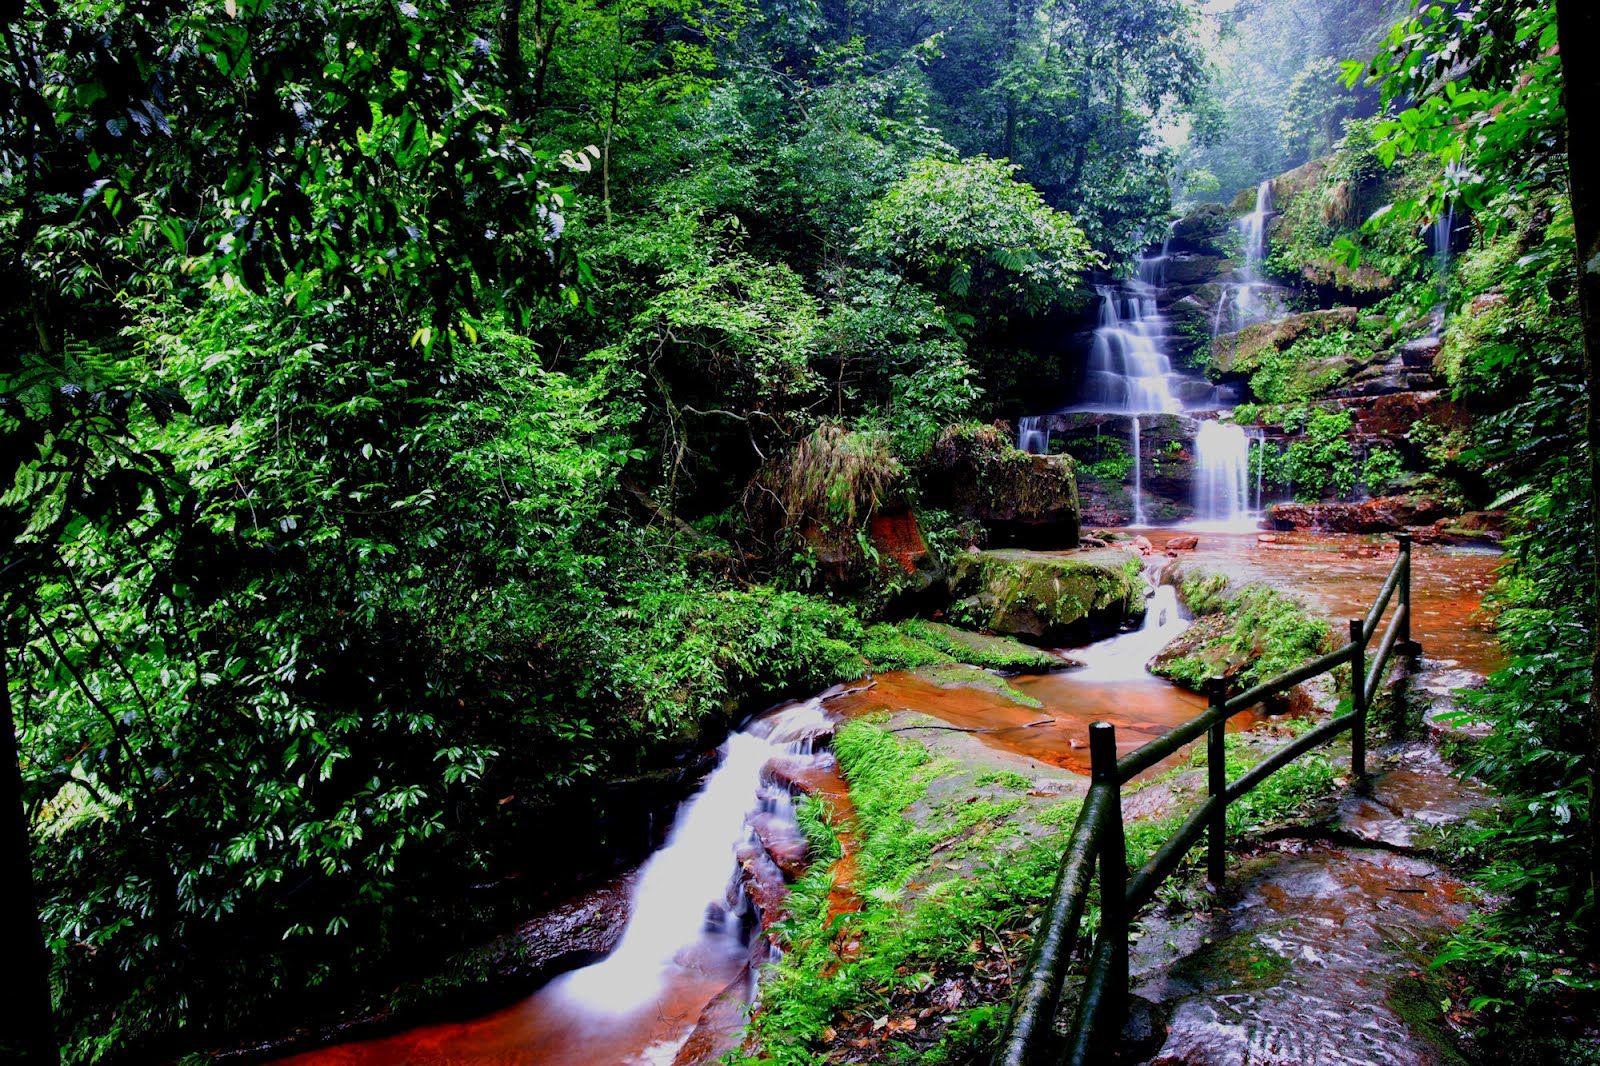 Paisajes naturales de china jard n chino pinterest - Jardines y paisajes ...